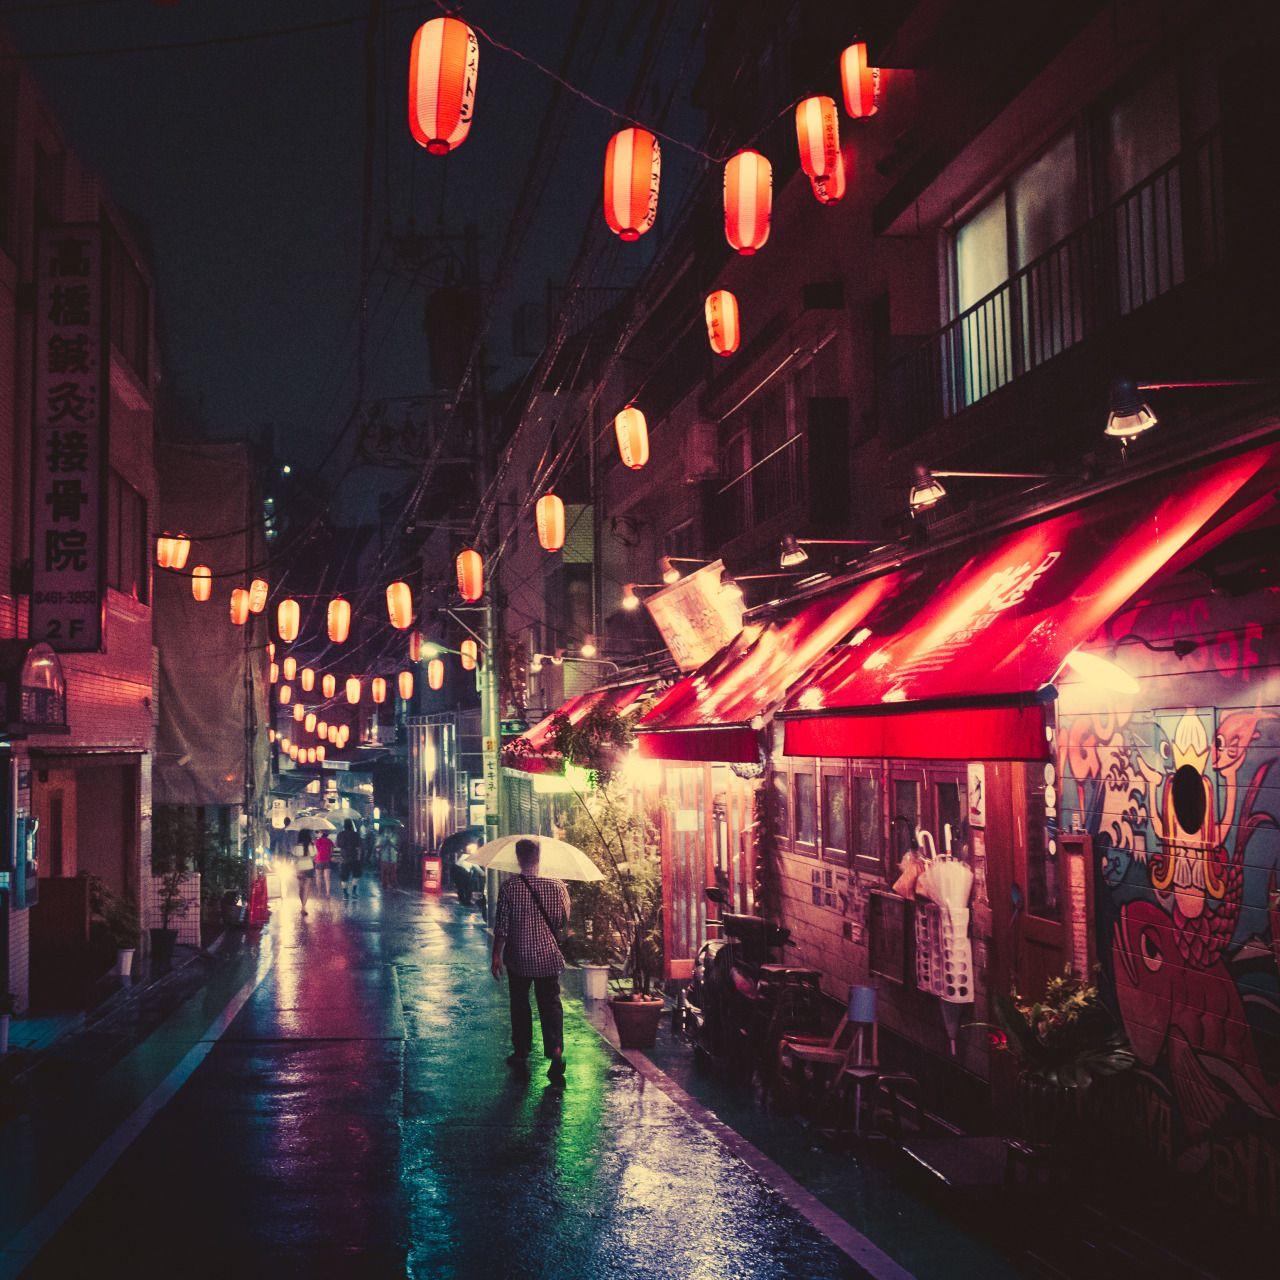 tokyo city for pinterest - photo #22